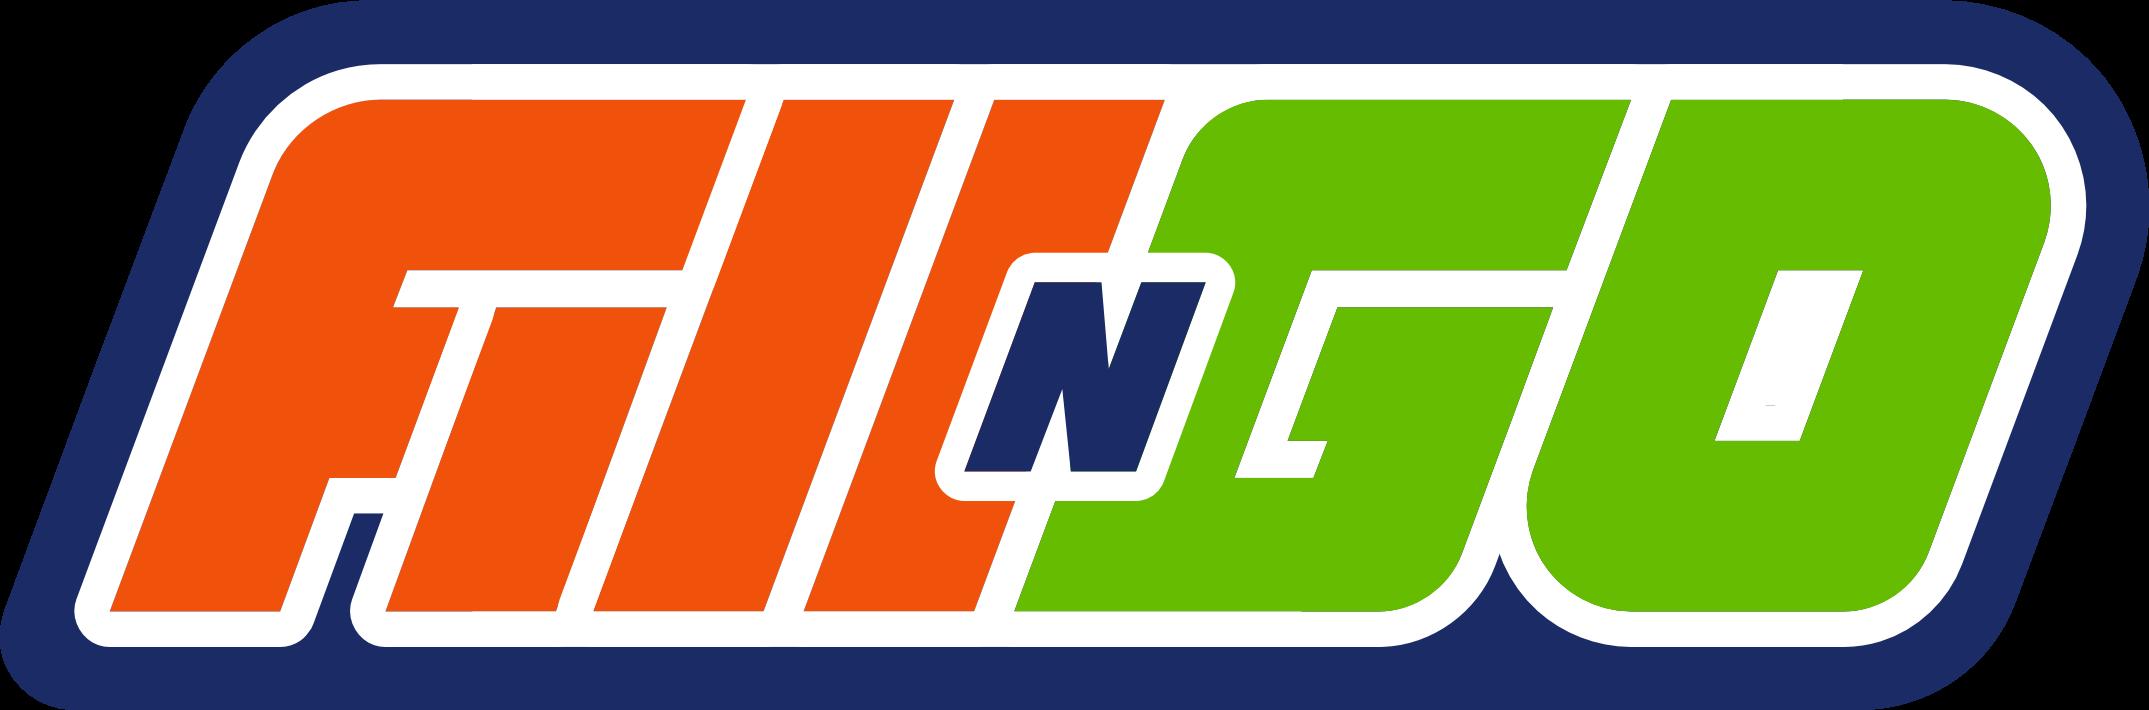 Ascona Fill N Go Logo